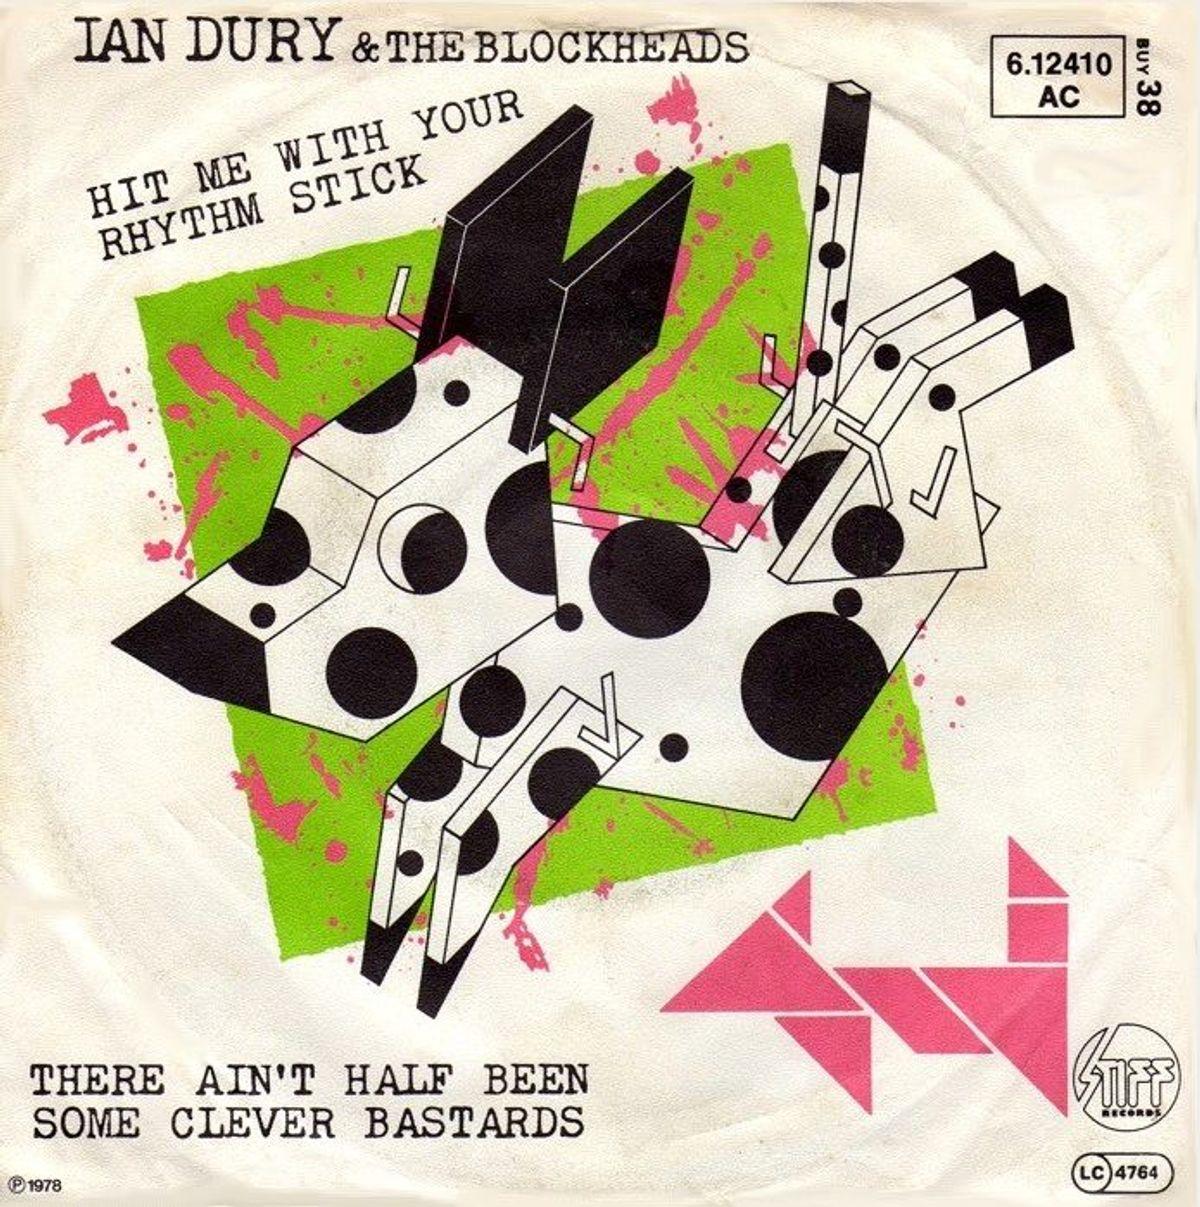 #IanDuryEtc - Ian Dury & the Blockheads - Hit Me With Your Rhythm SticT